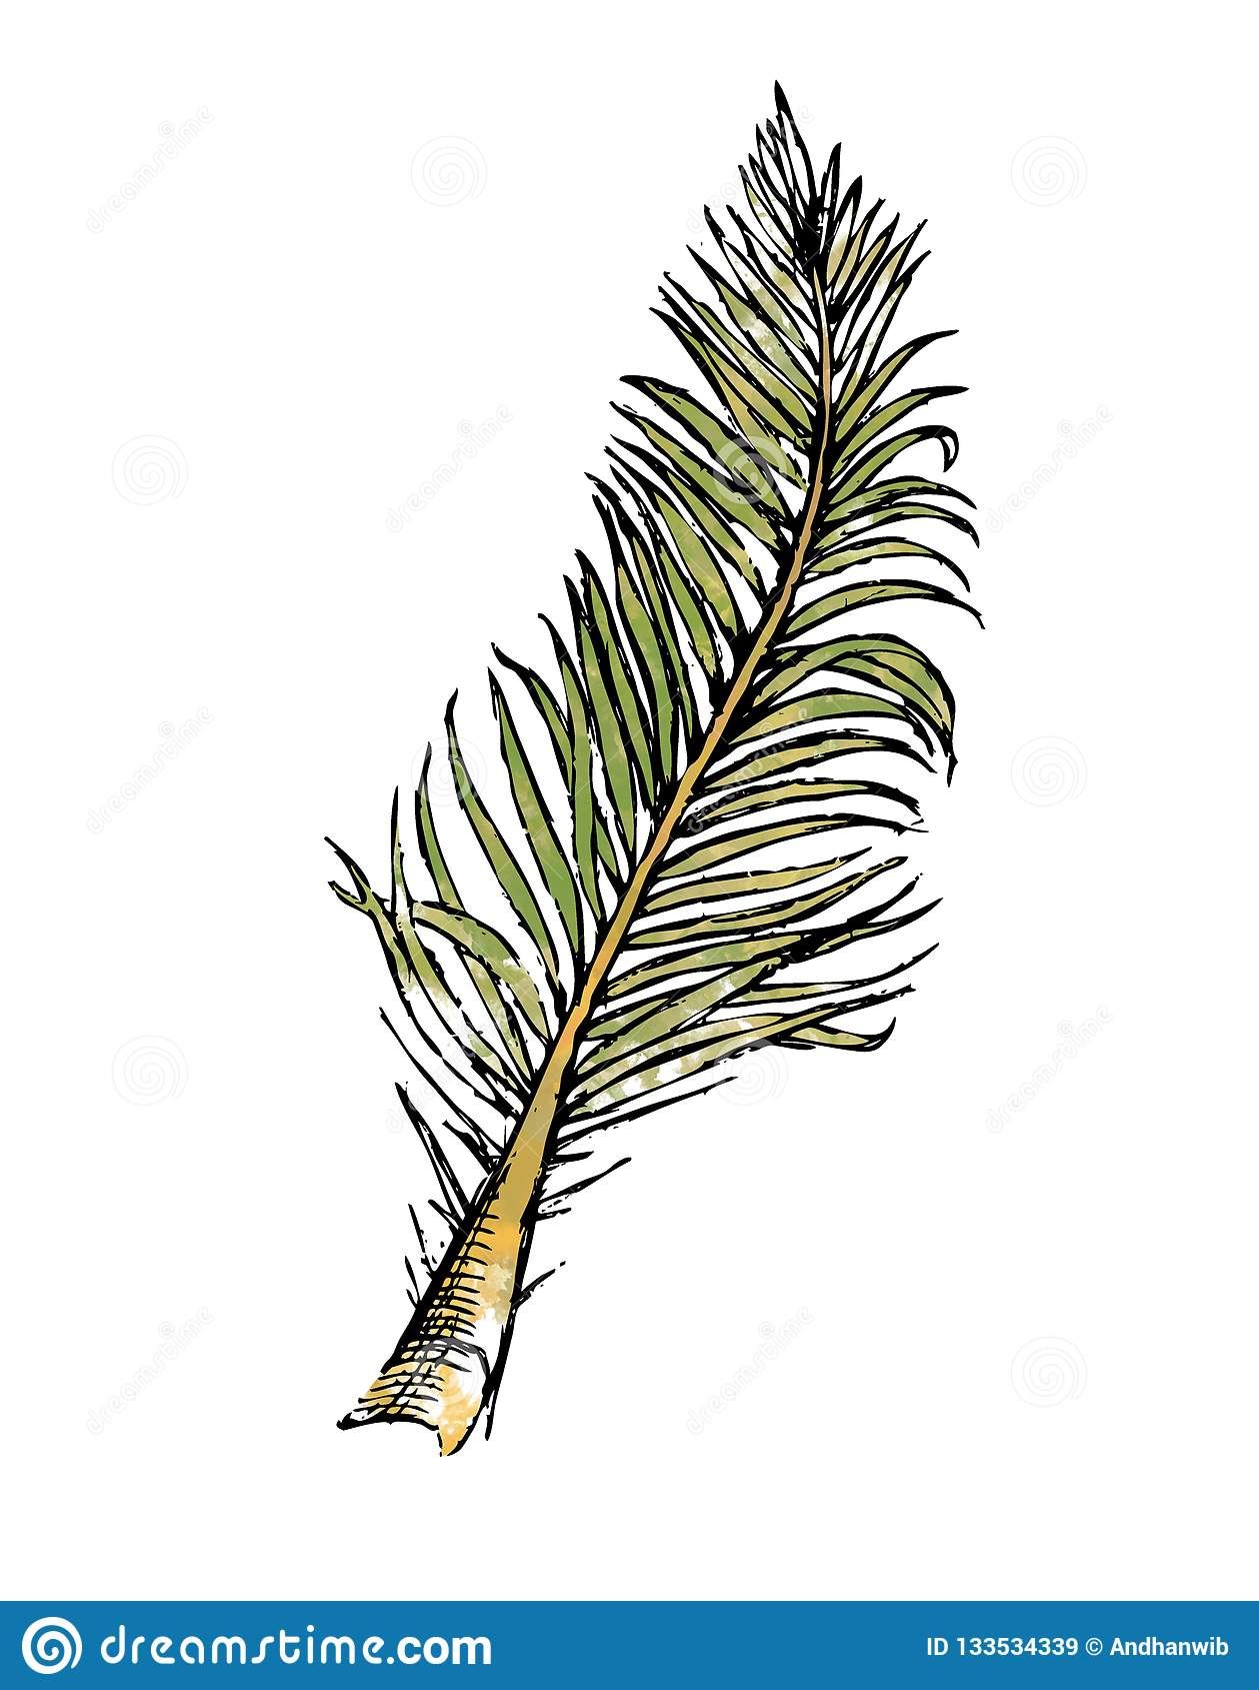 Иллюстрация Watercolour Pinnate лист кокоса